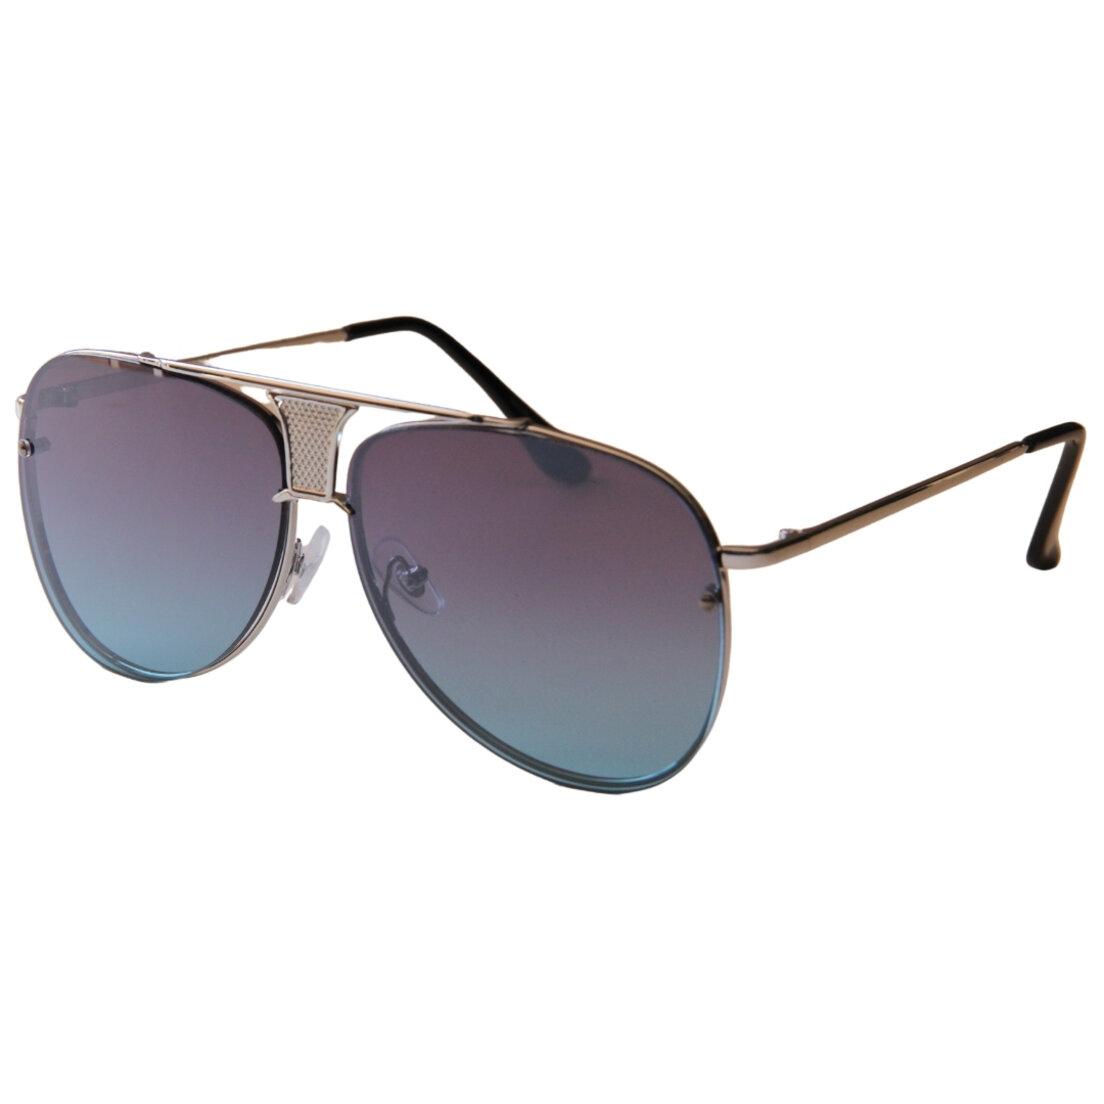 OUTLET - Óculos de Sol Khatto Aviador Retrô - Azul